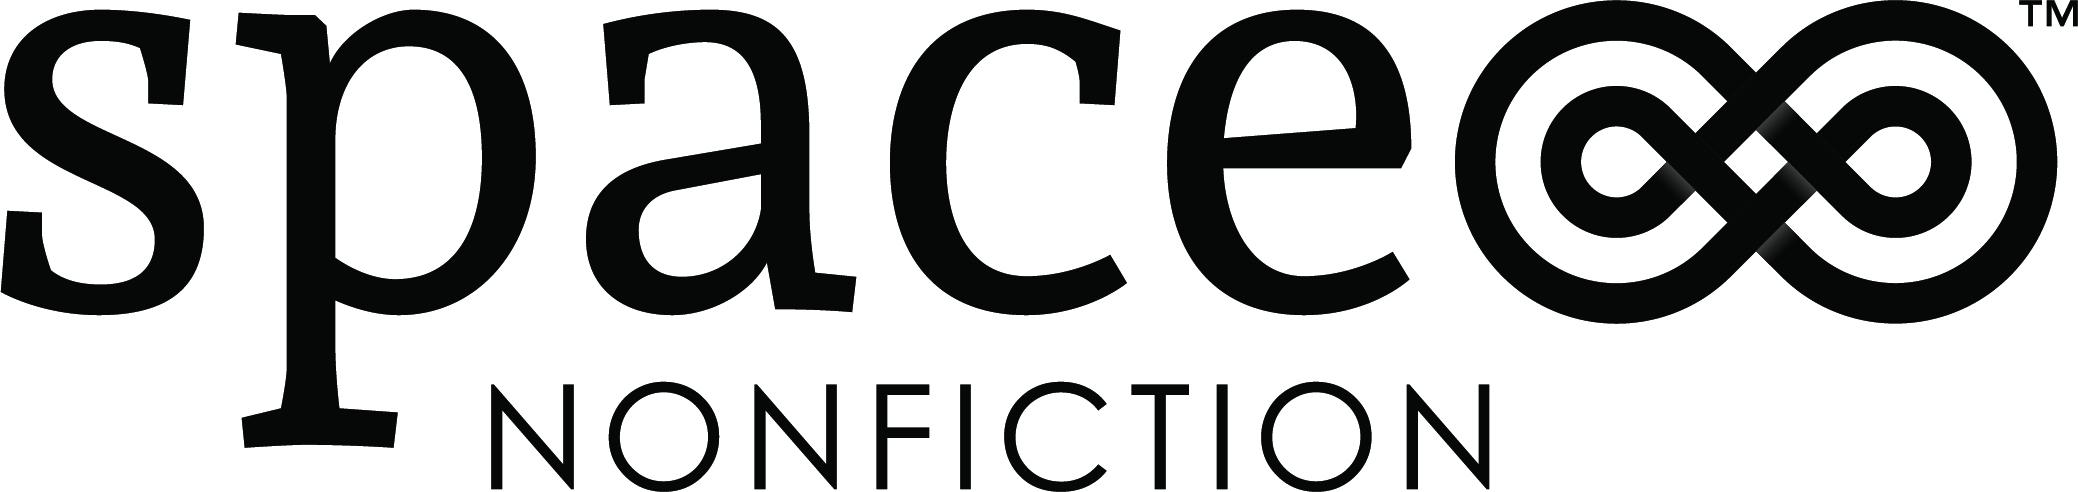 space8-logo-black.jpg